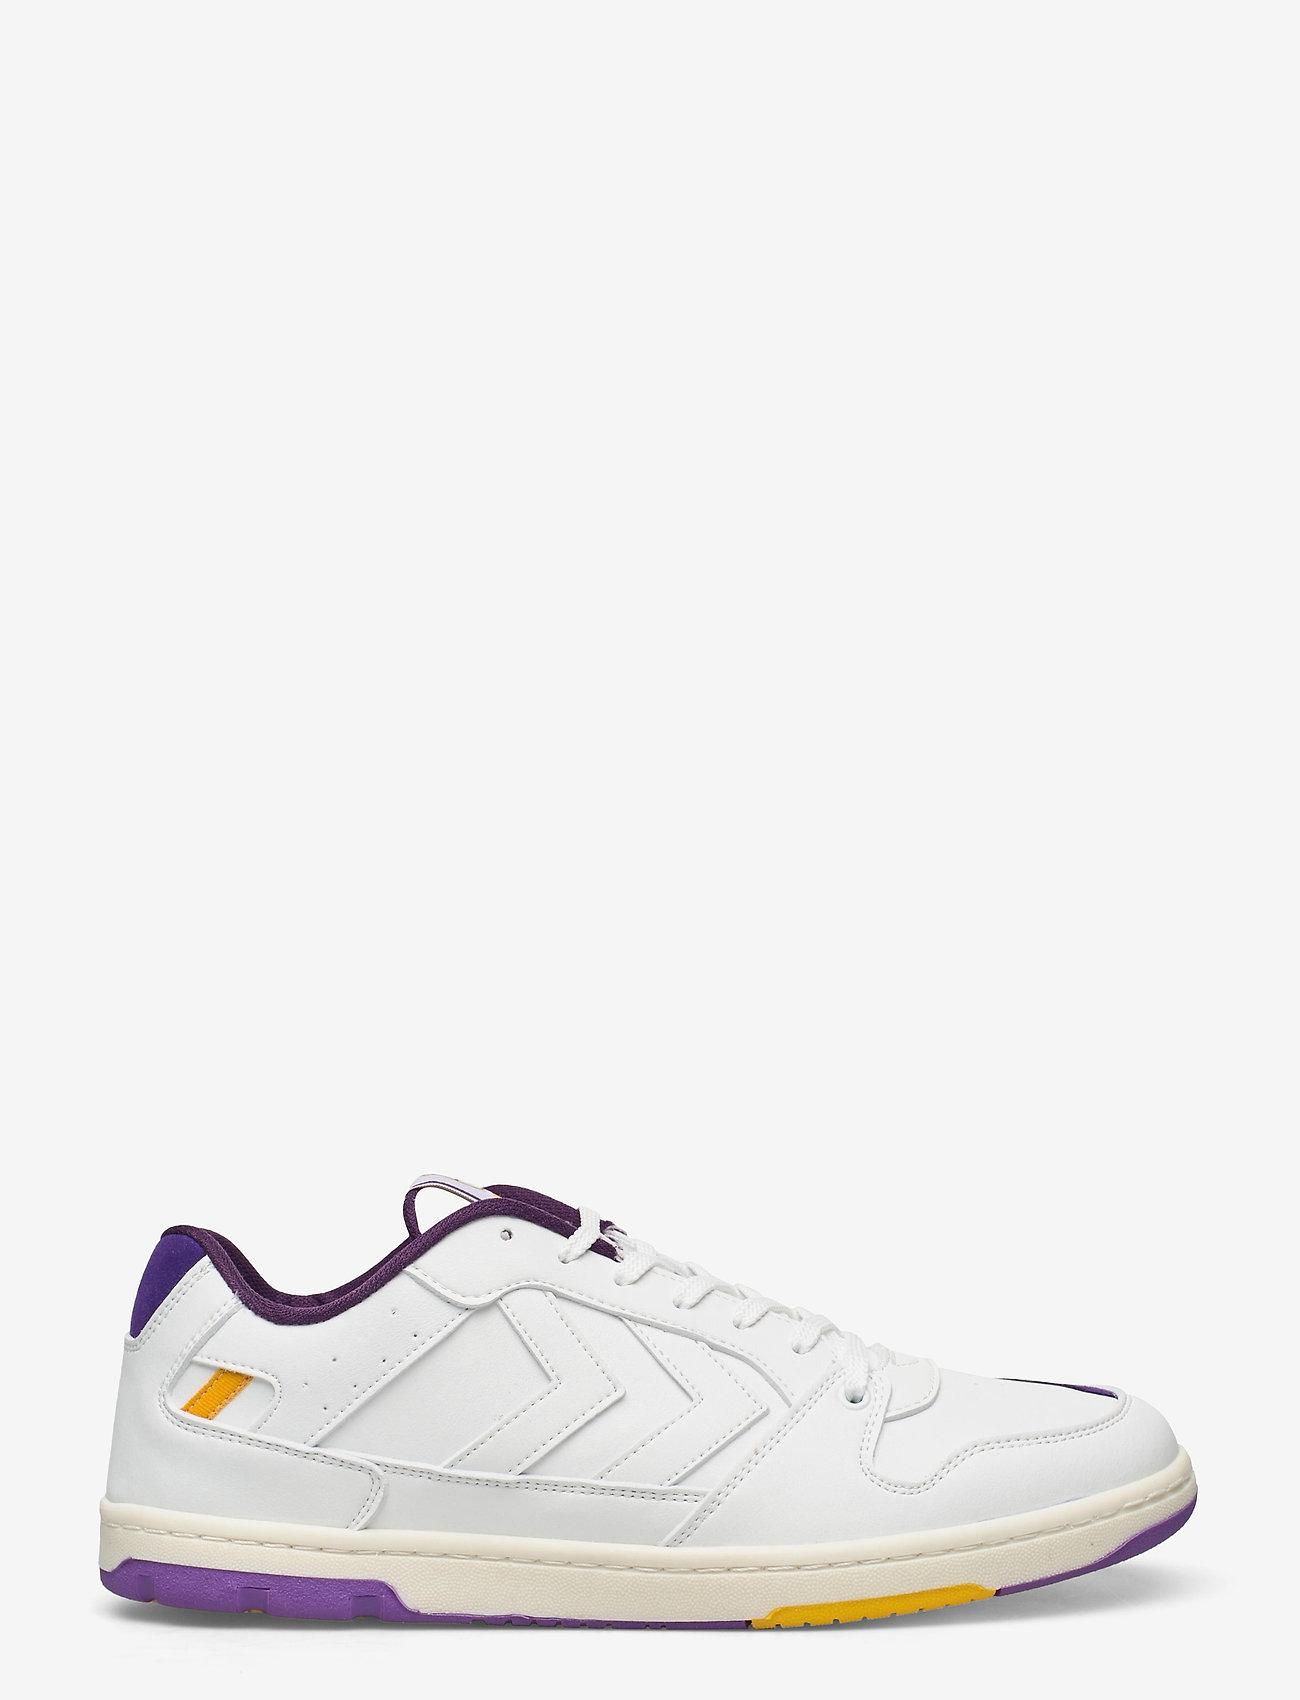 Hummel - POWER PLAY VEGAN ARCHIVE - laag sneakers - white/dahlia purple/geranium - 0